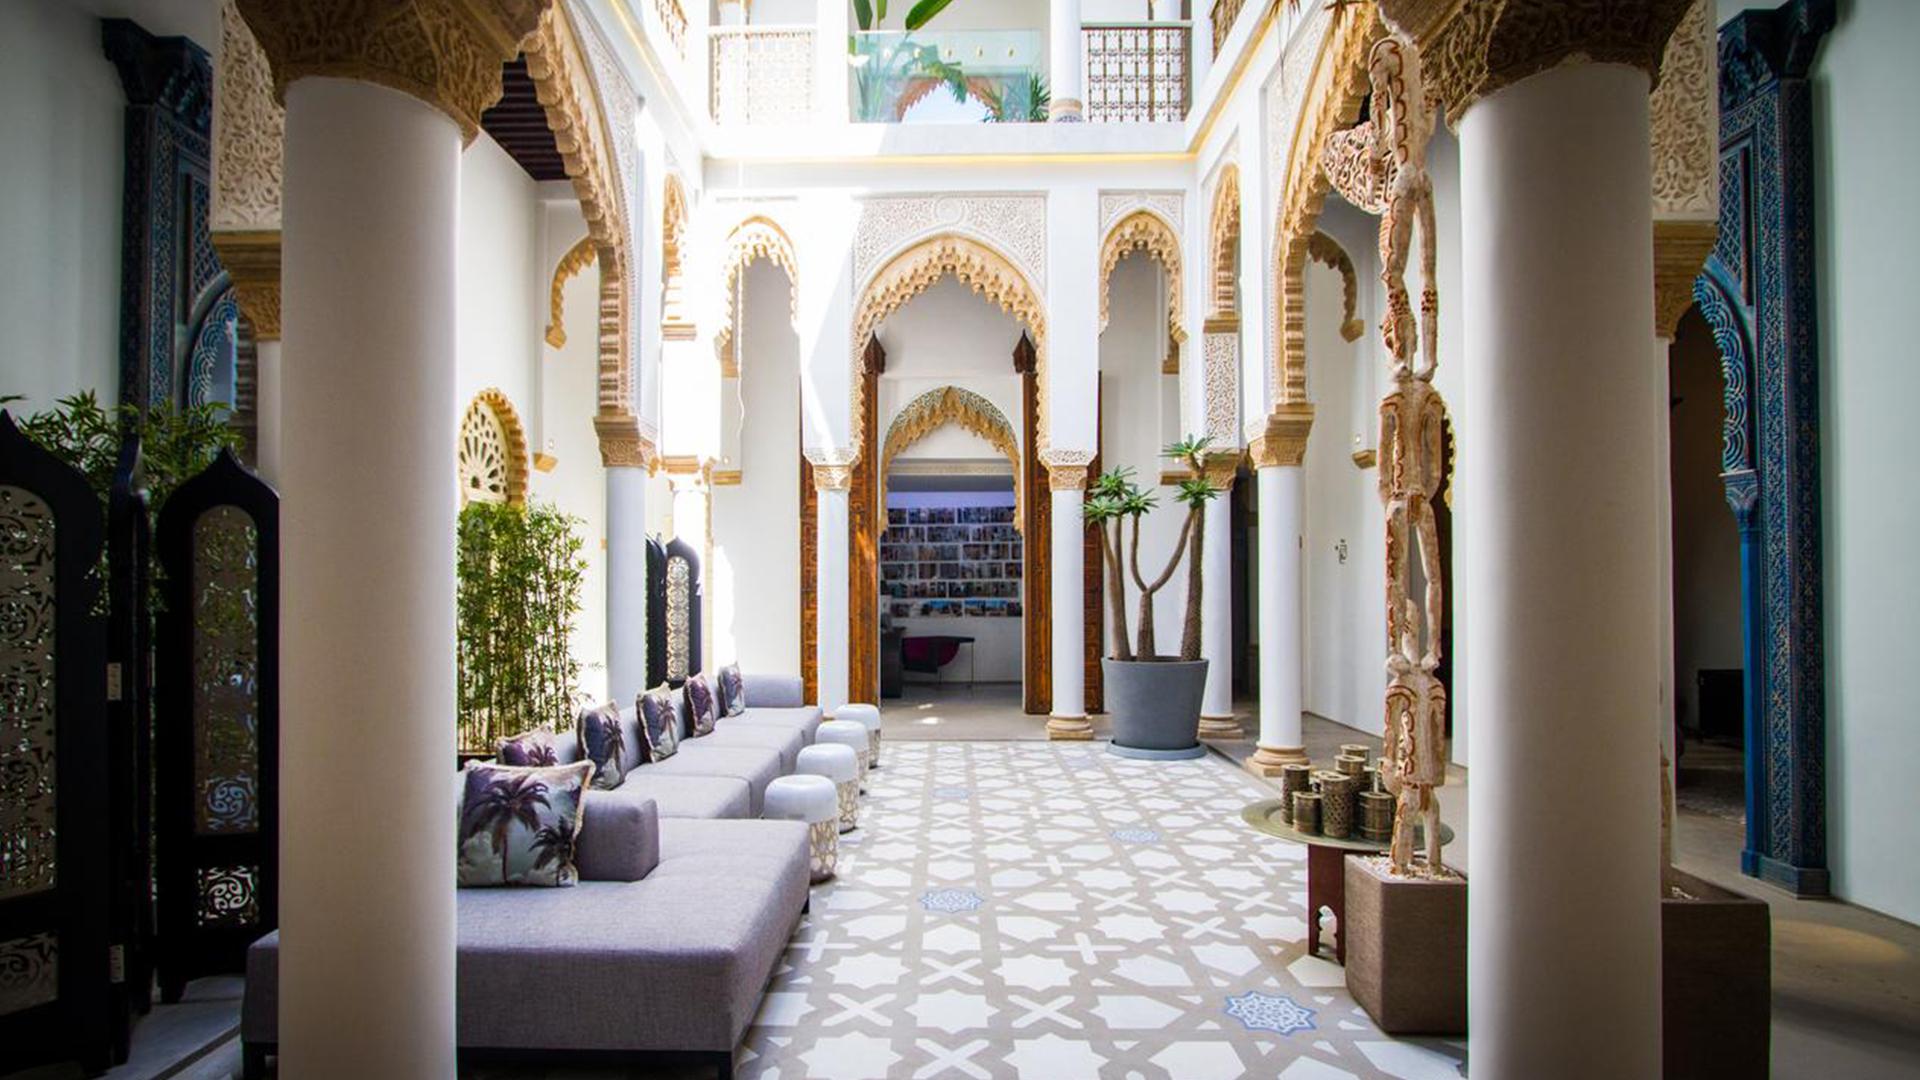 Euphoriad Rabat, Morocco